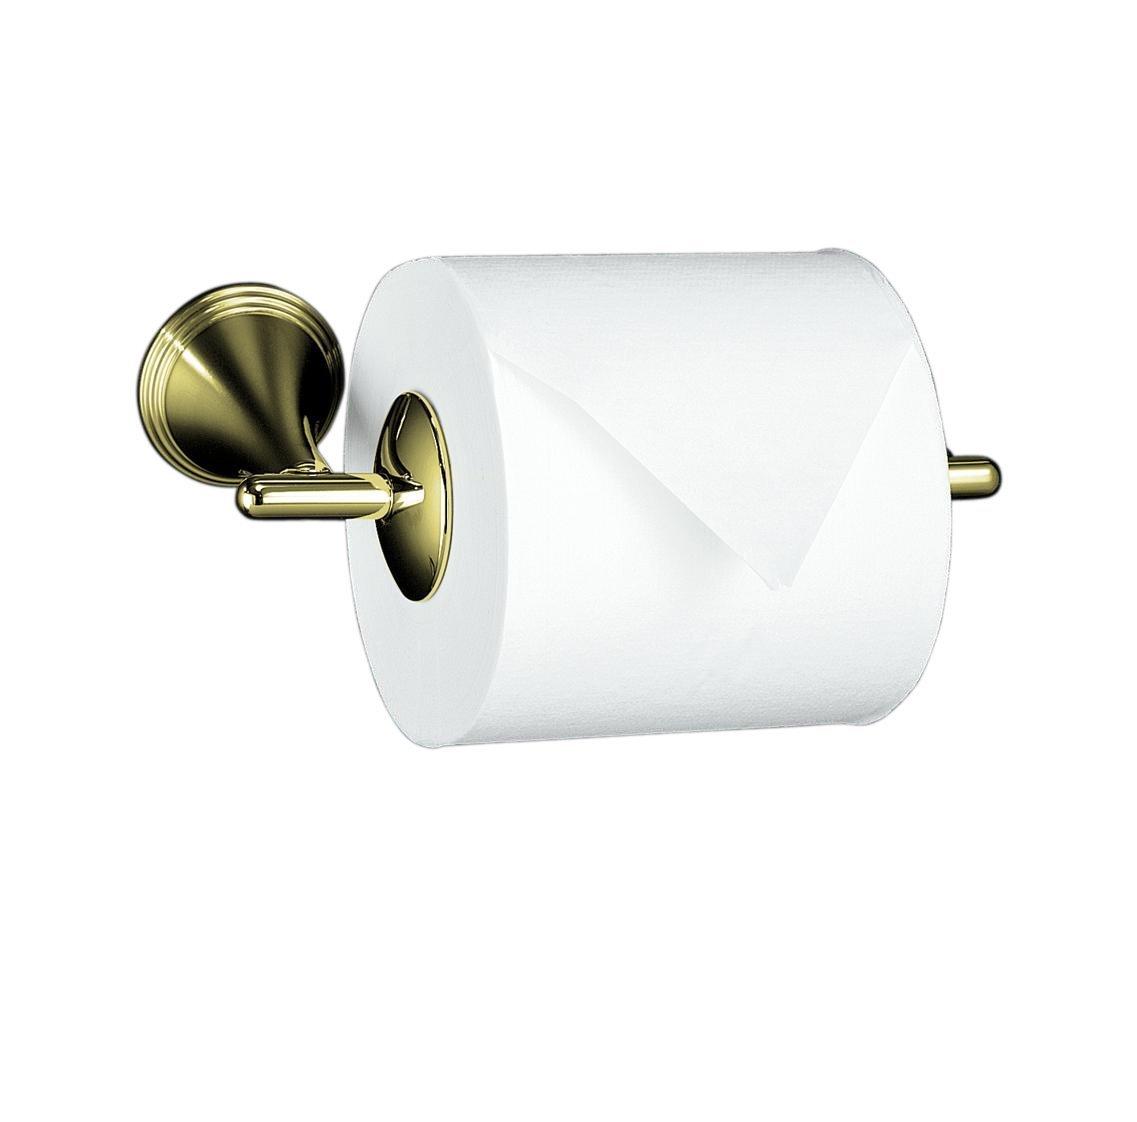 Kohler K 361 Af Finial Traditional Toilet Tissue Holder Vibrant K361 Wiring Diagram French Gold Paper Holders